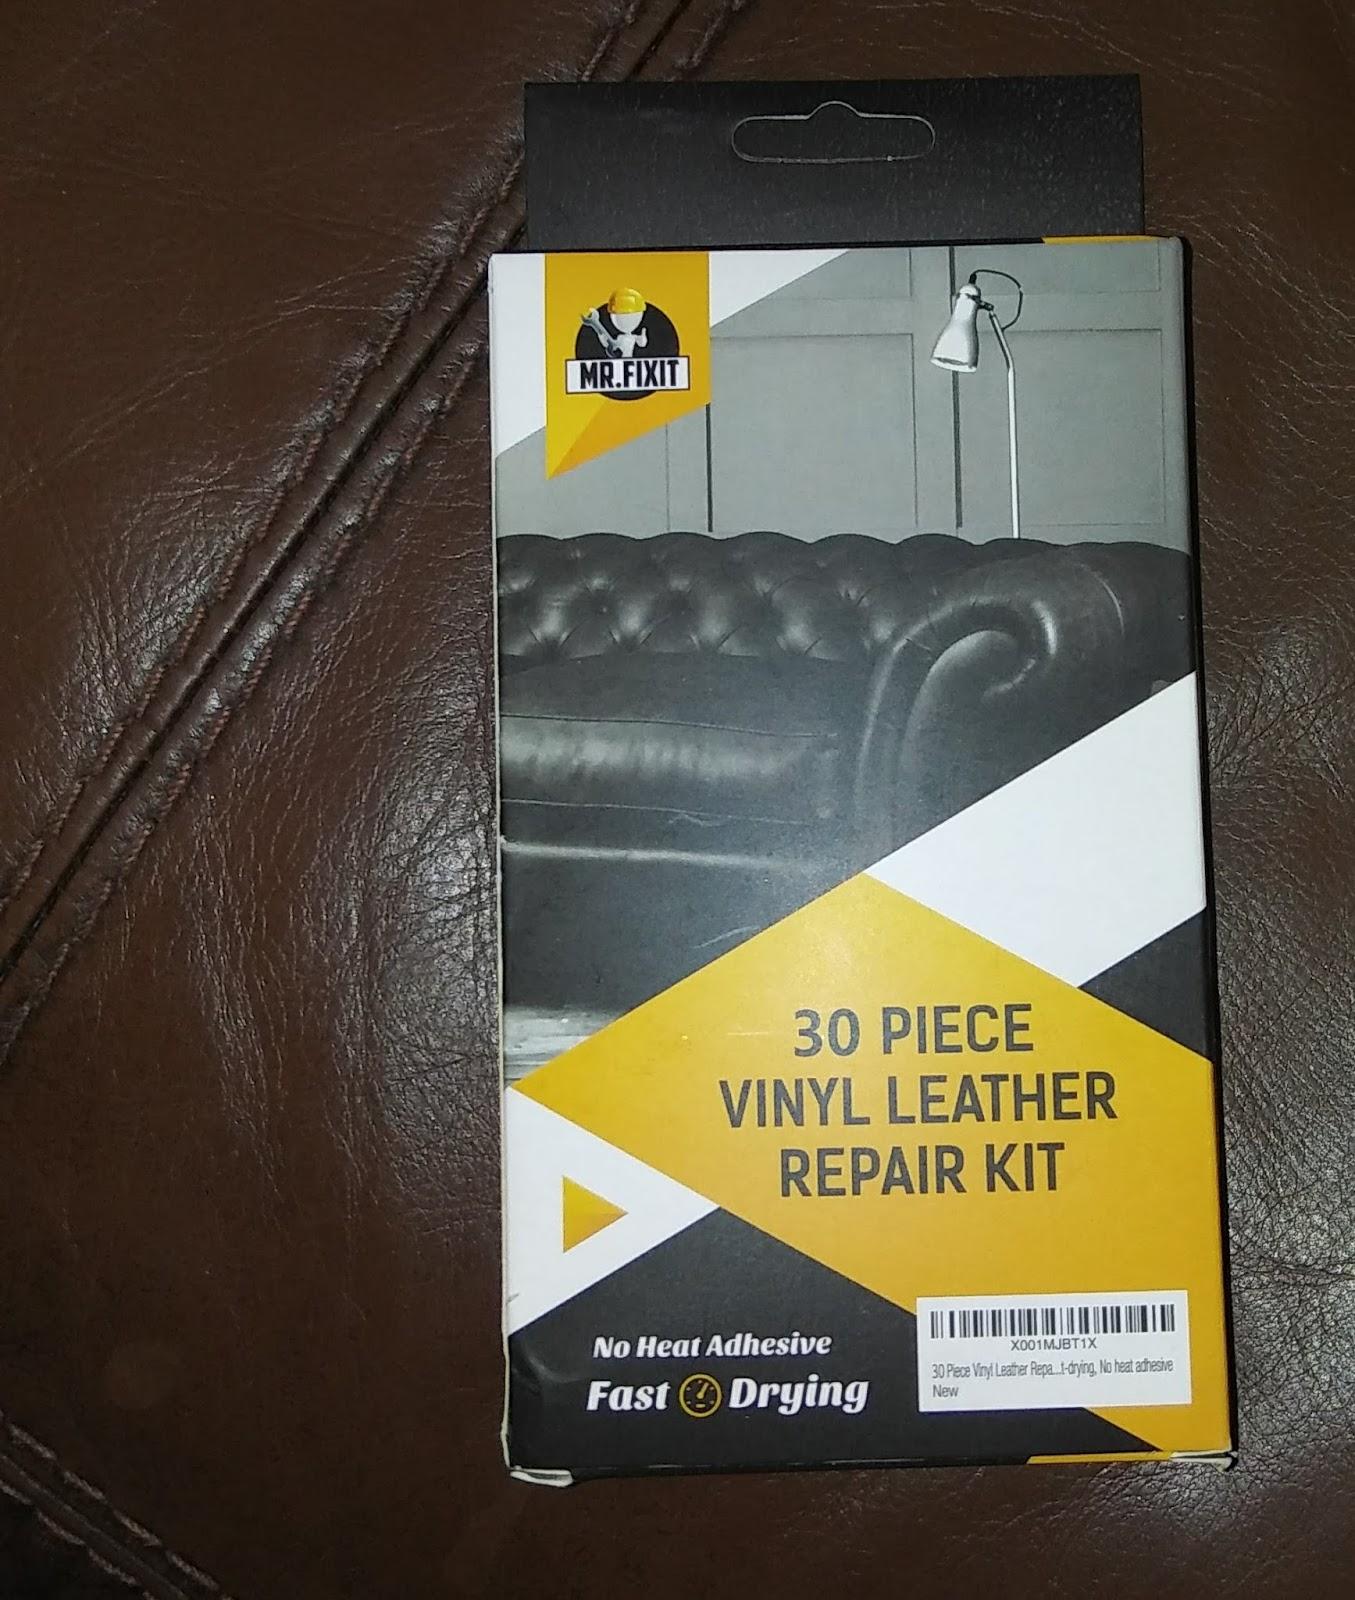 Bonnie Bells Voice: Vinyl Leather Repair Kit 4 car and sofa